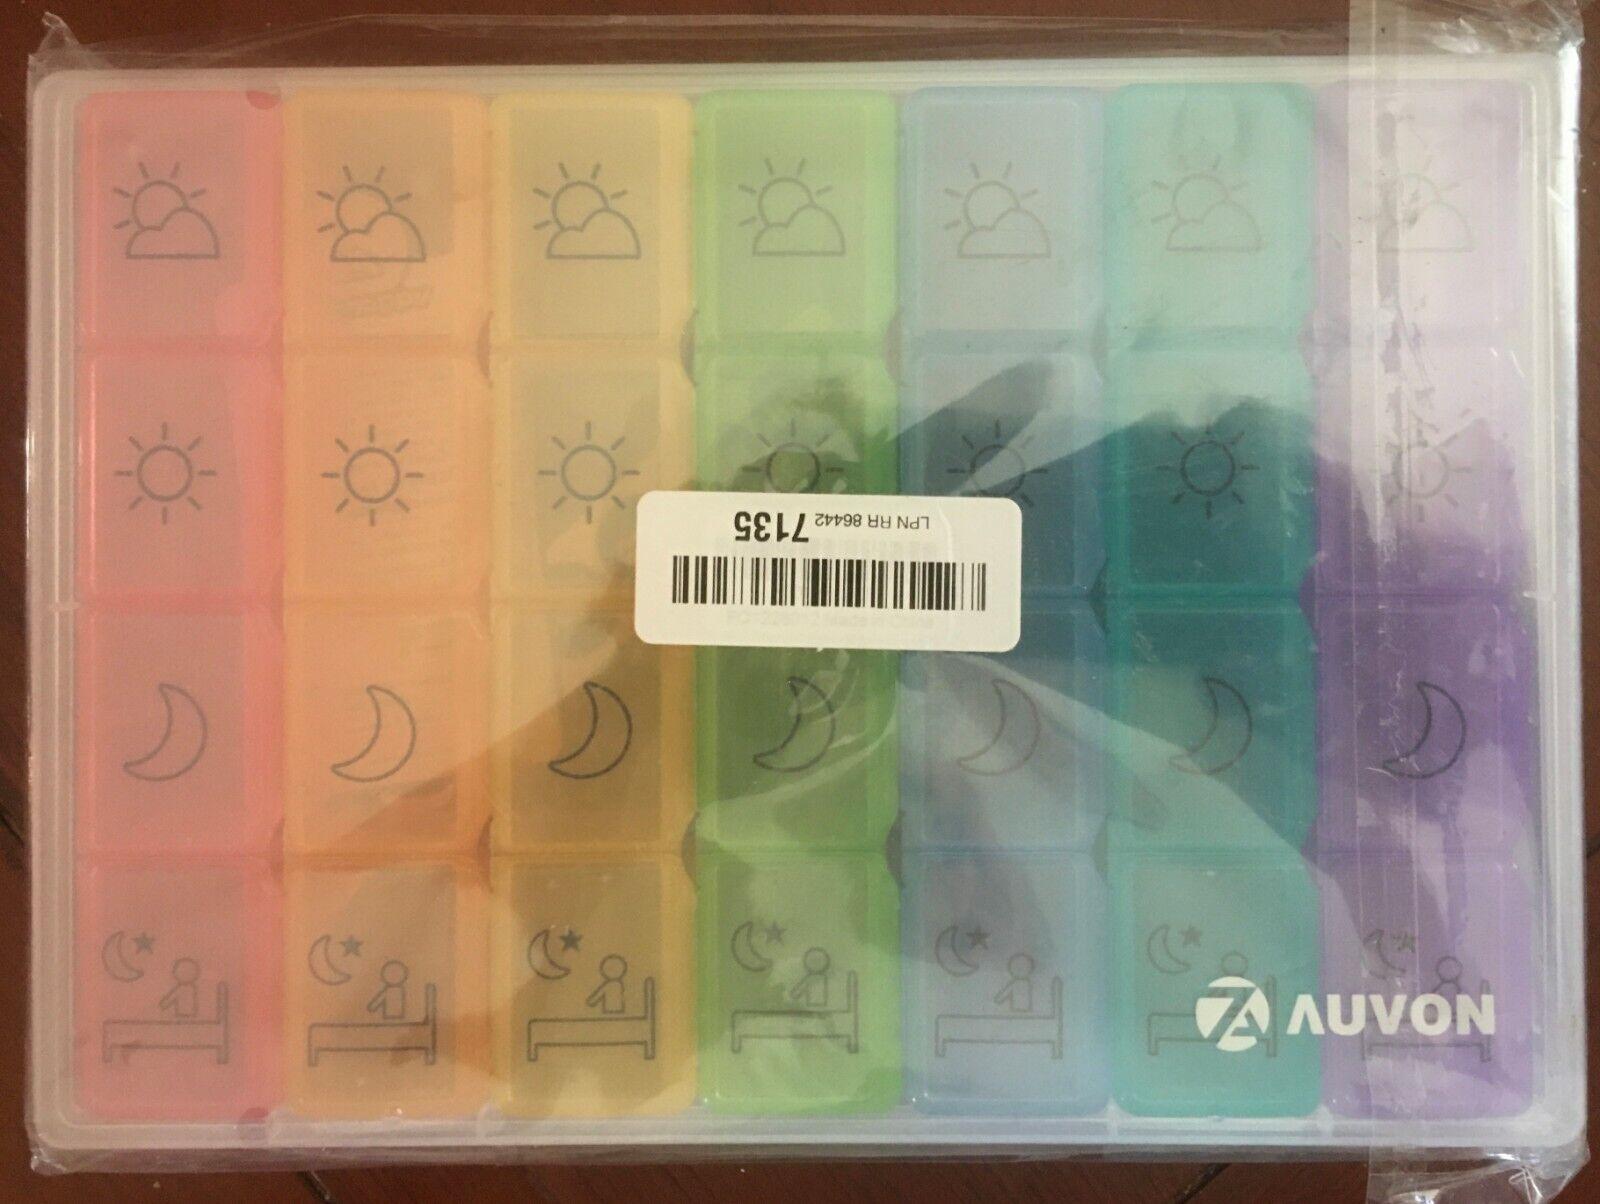 AUVON iMedassist Weekly AM/PM Pill Box, Portable Travel Pill